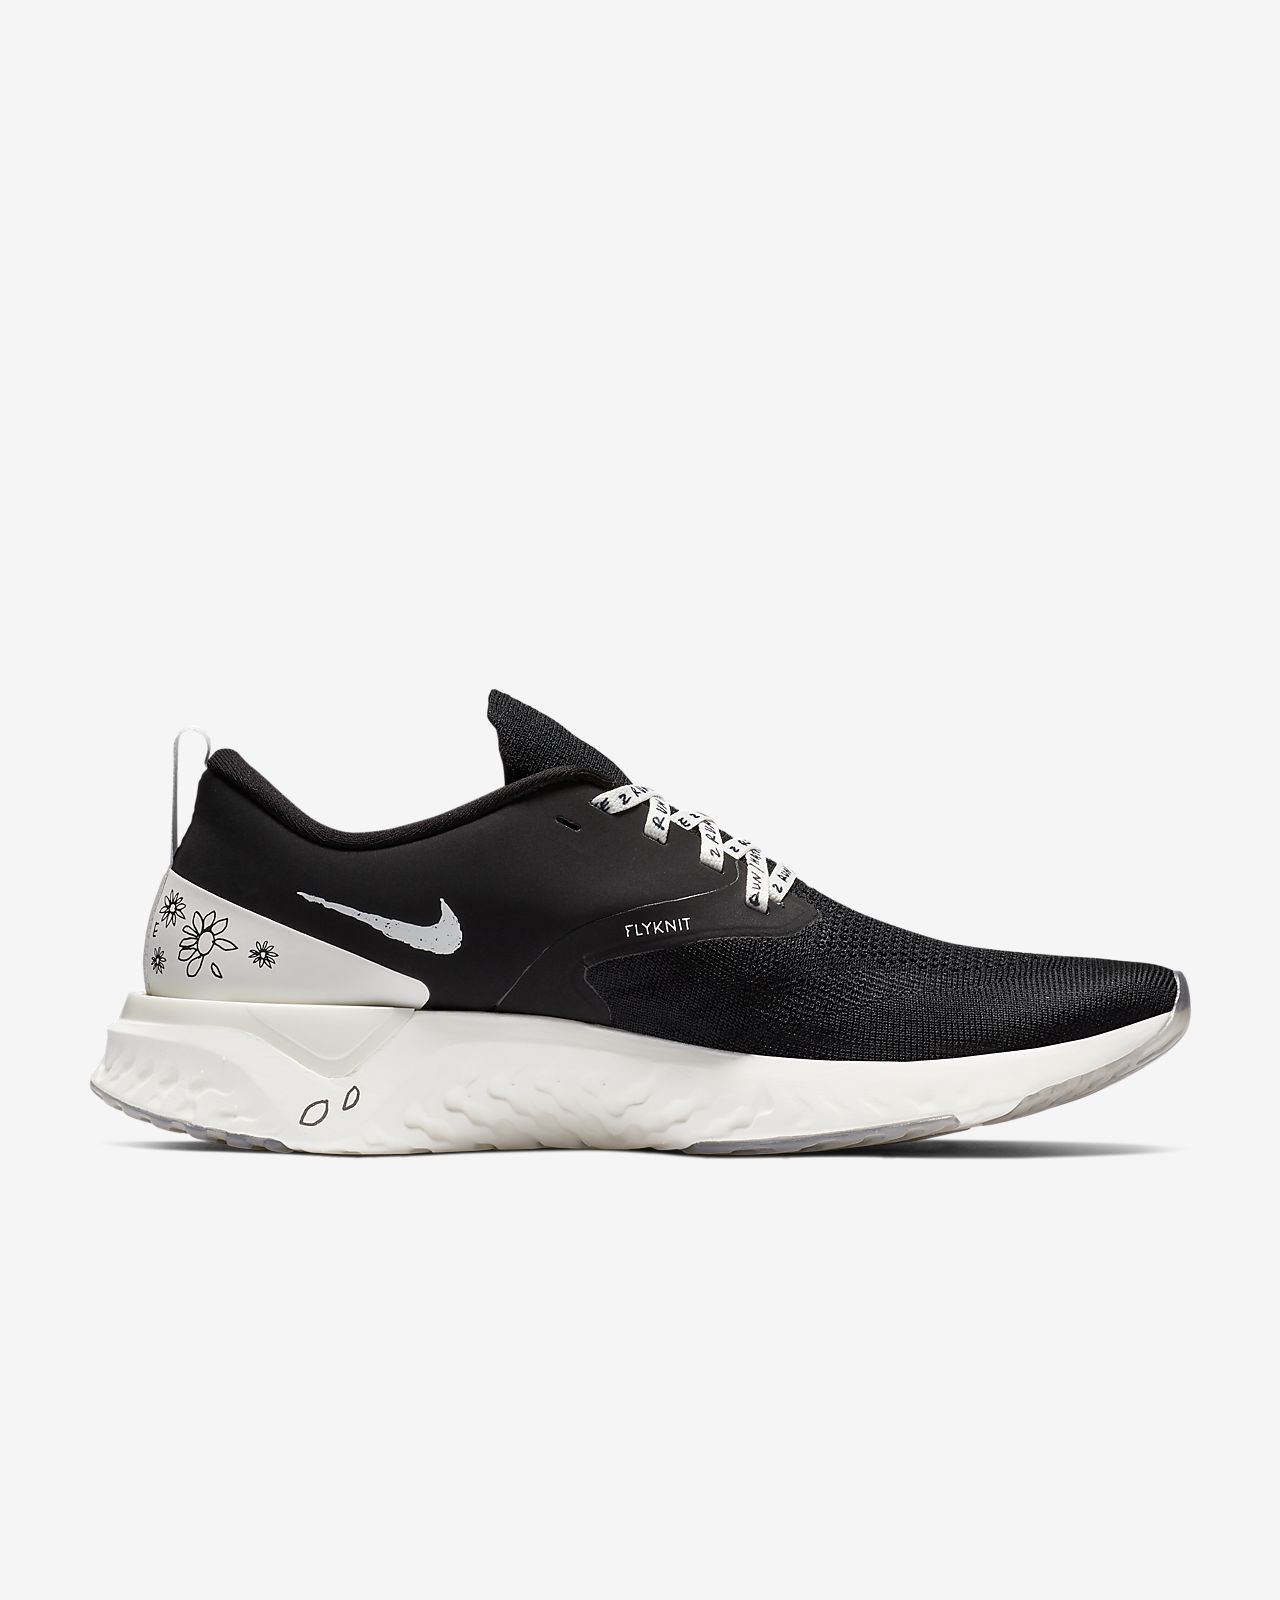 fe854f2edbf4fb ... Nike Odyssey React Flyknit 2 Nathan Bell Men s Running Shoe